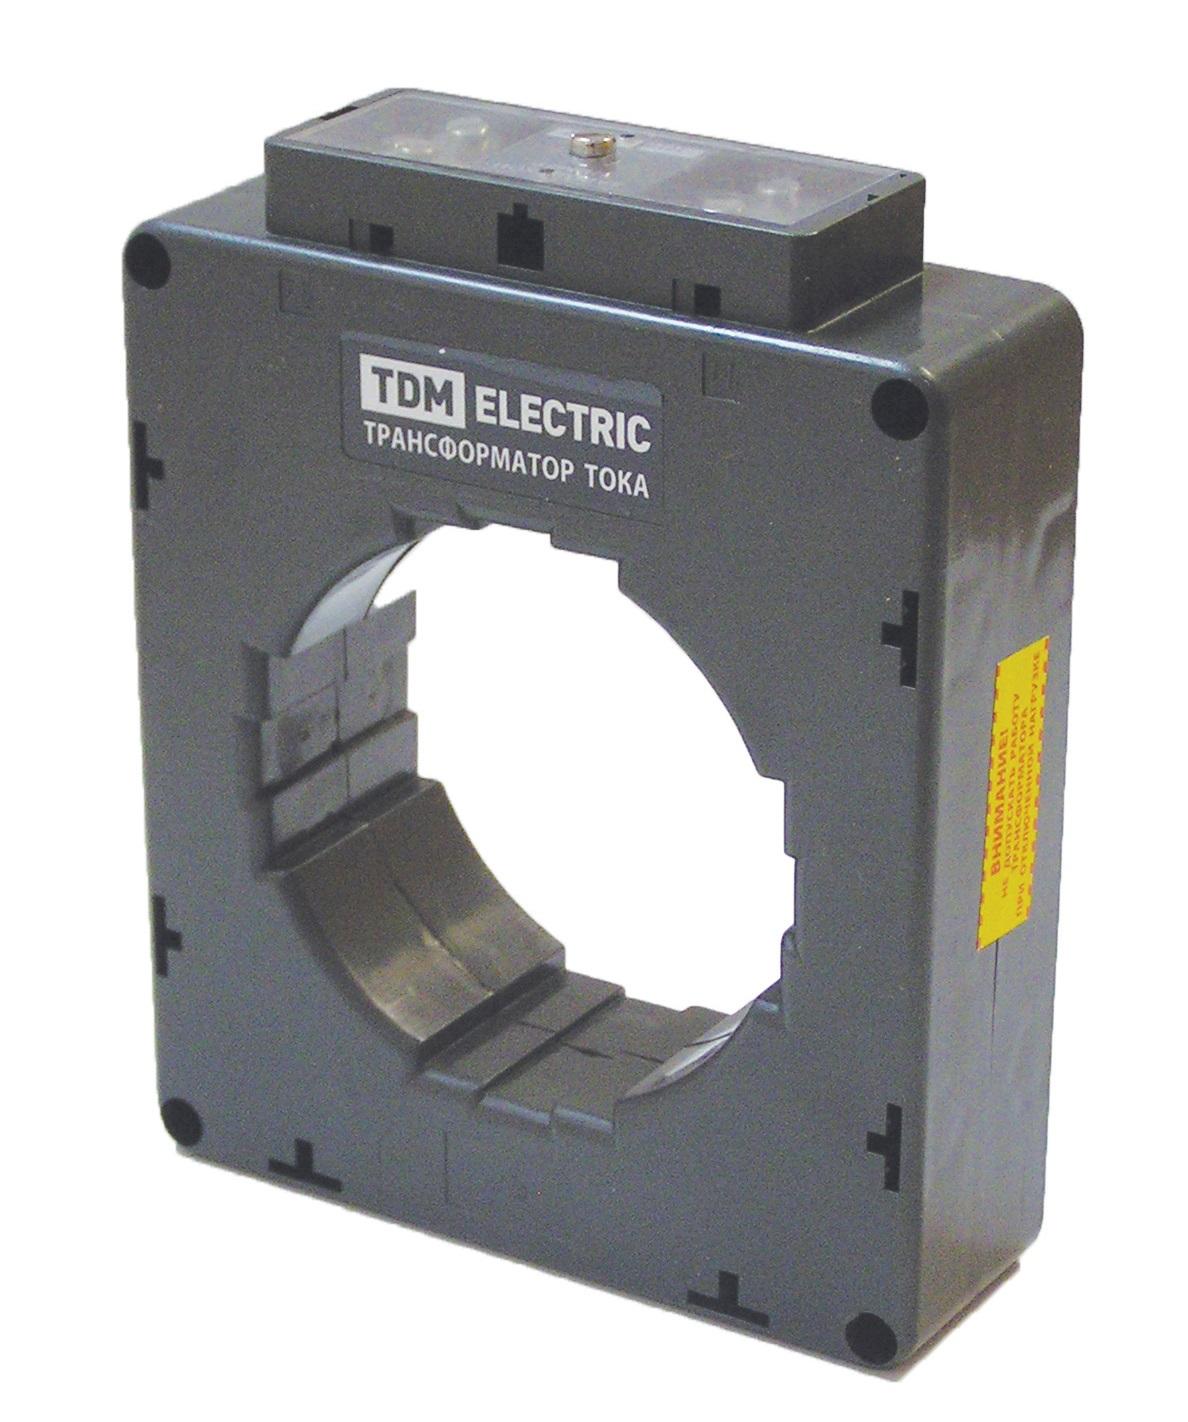 Трансформатор Tdm Sq1101-0158 трансформатор tdm sq1101 0149